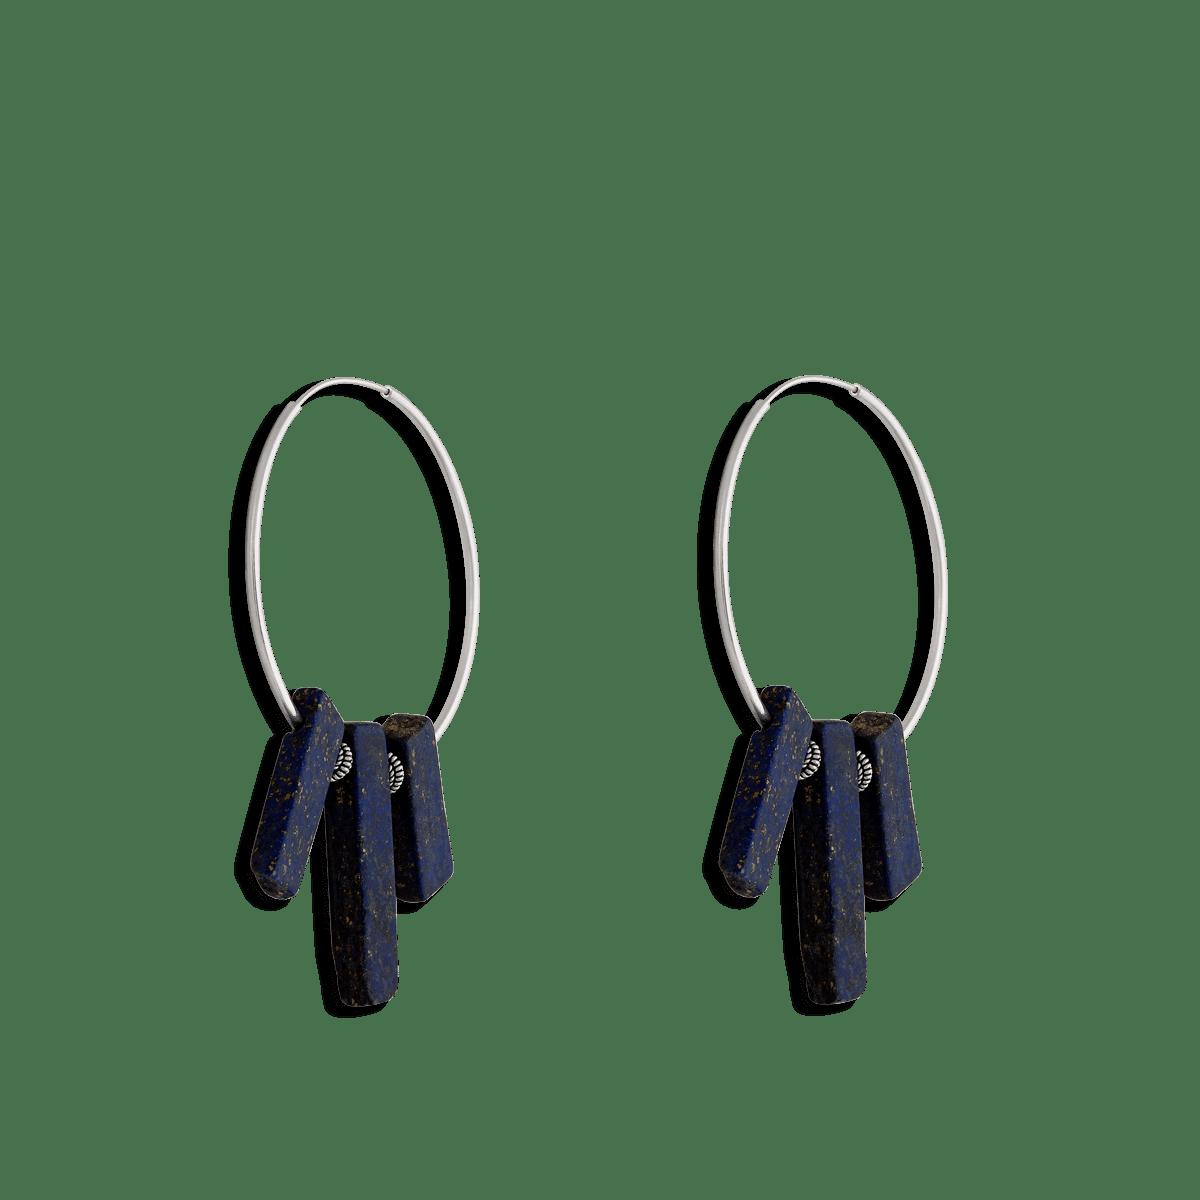 گوشواره نقره حلقه و سنگ